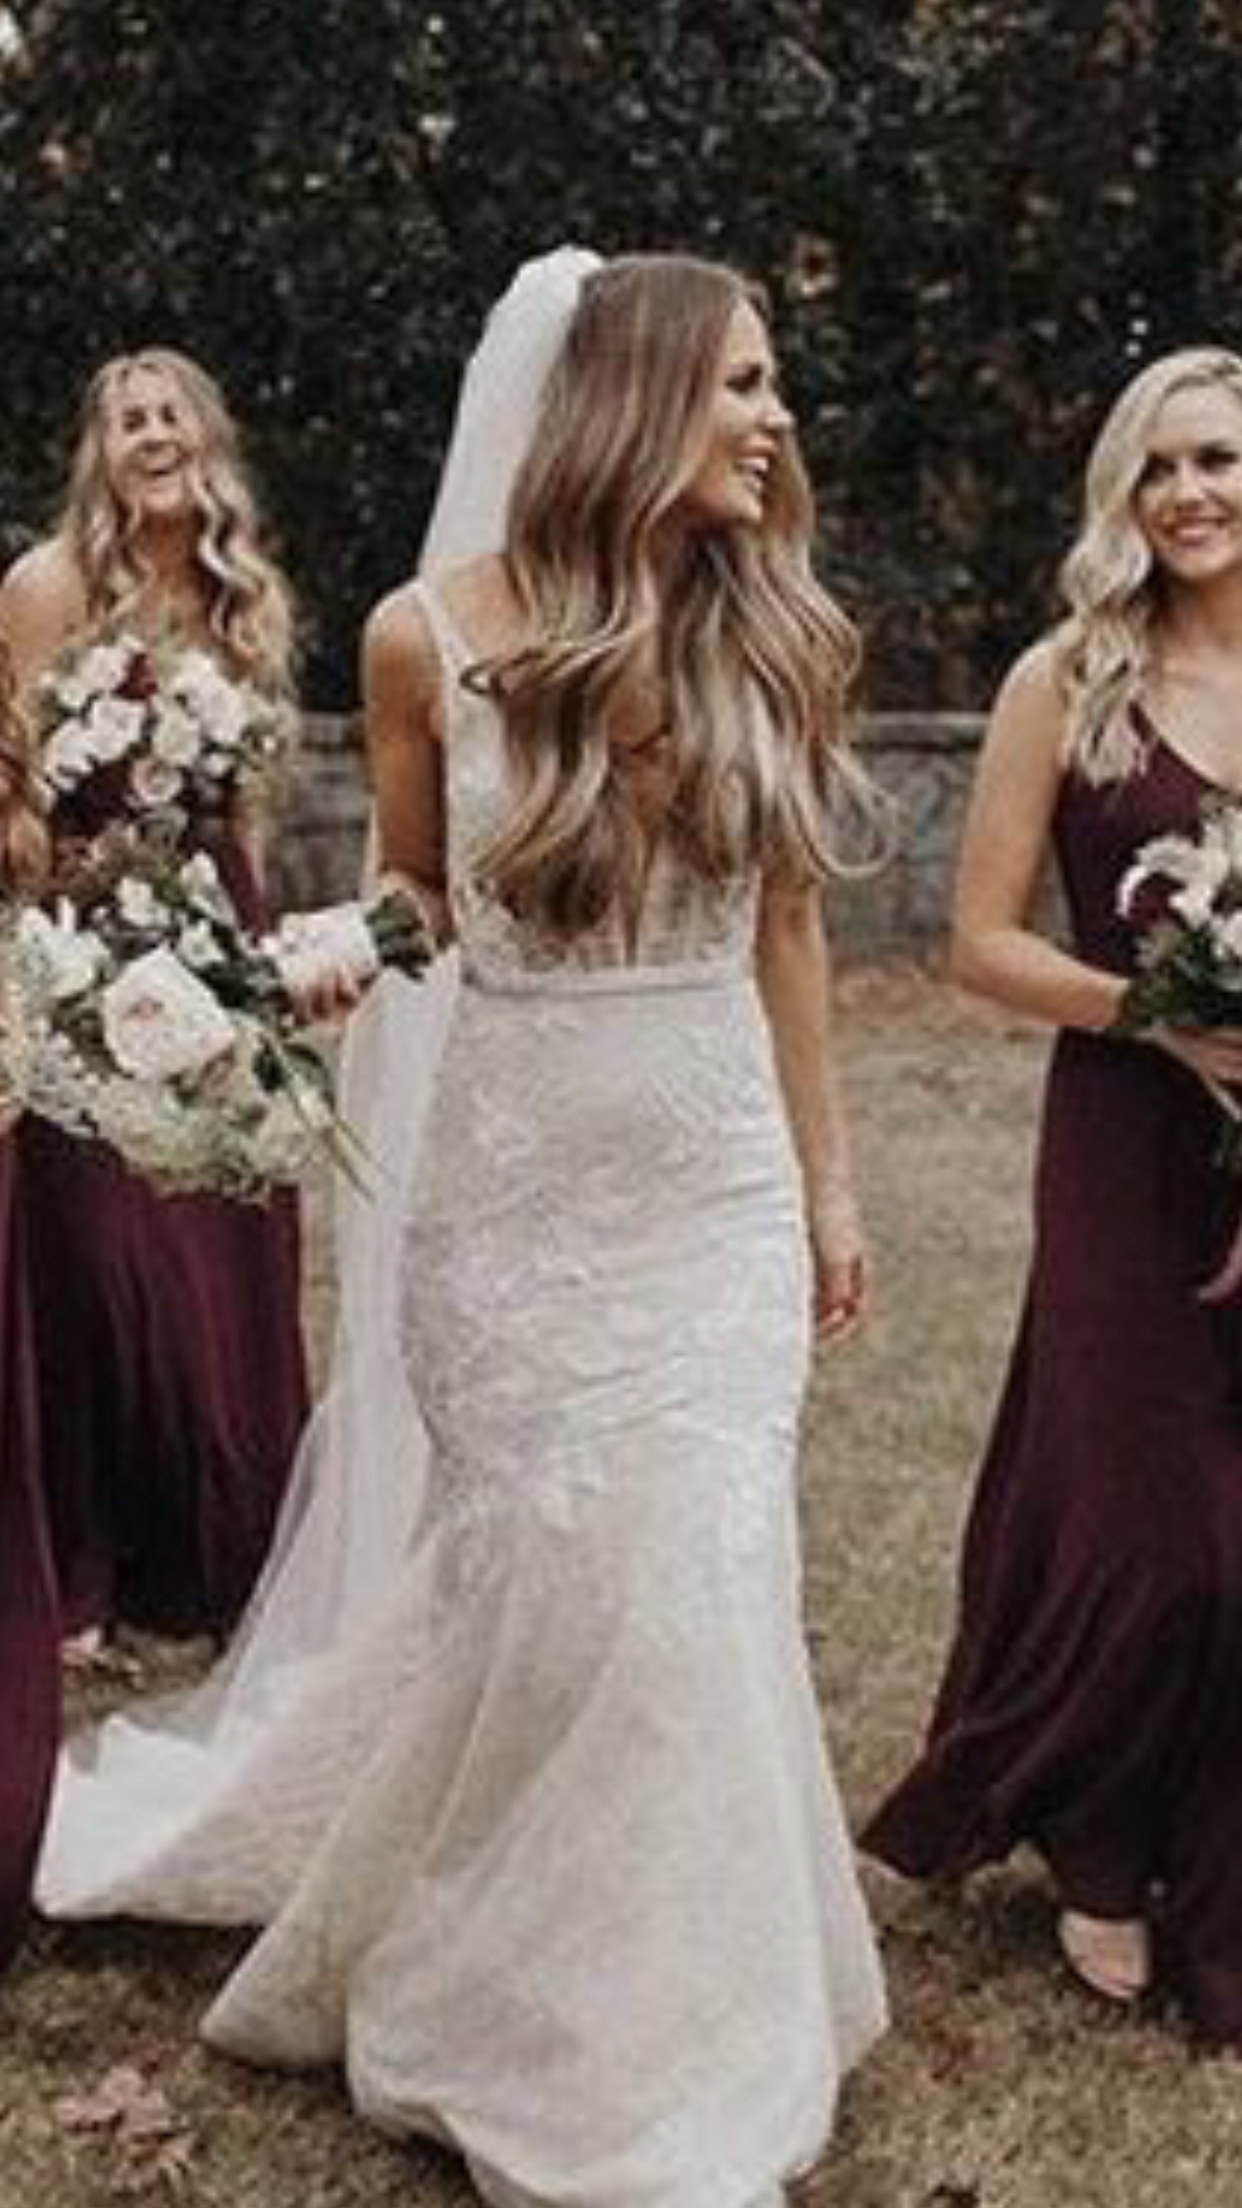 Hair Down Long Veil Wedding Hairstyles With Veil Loose Curls